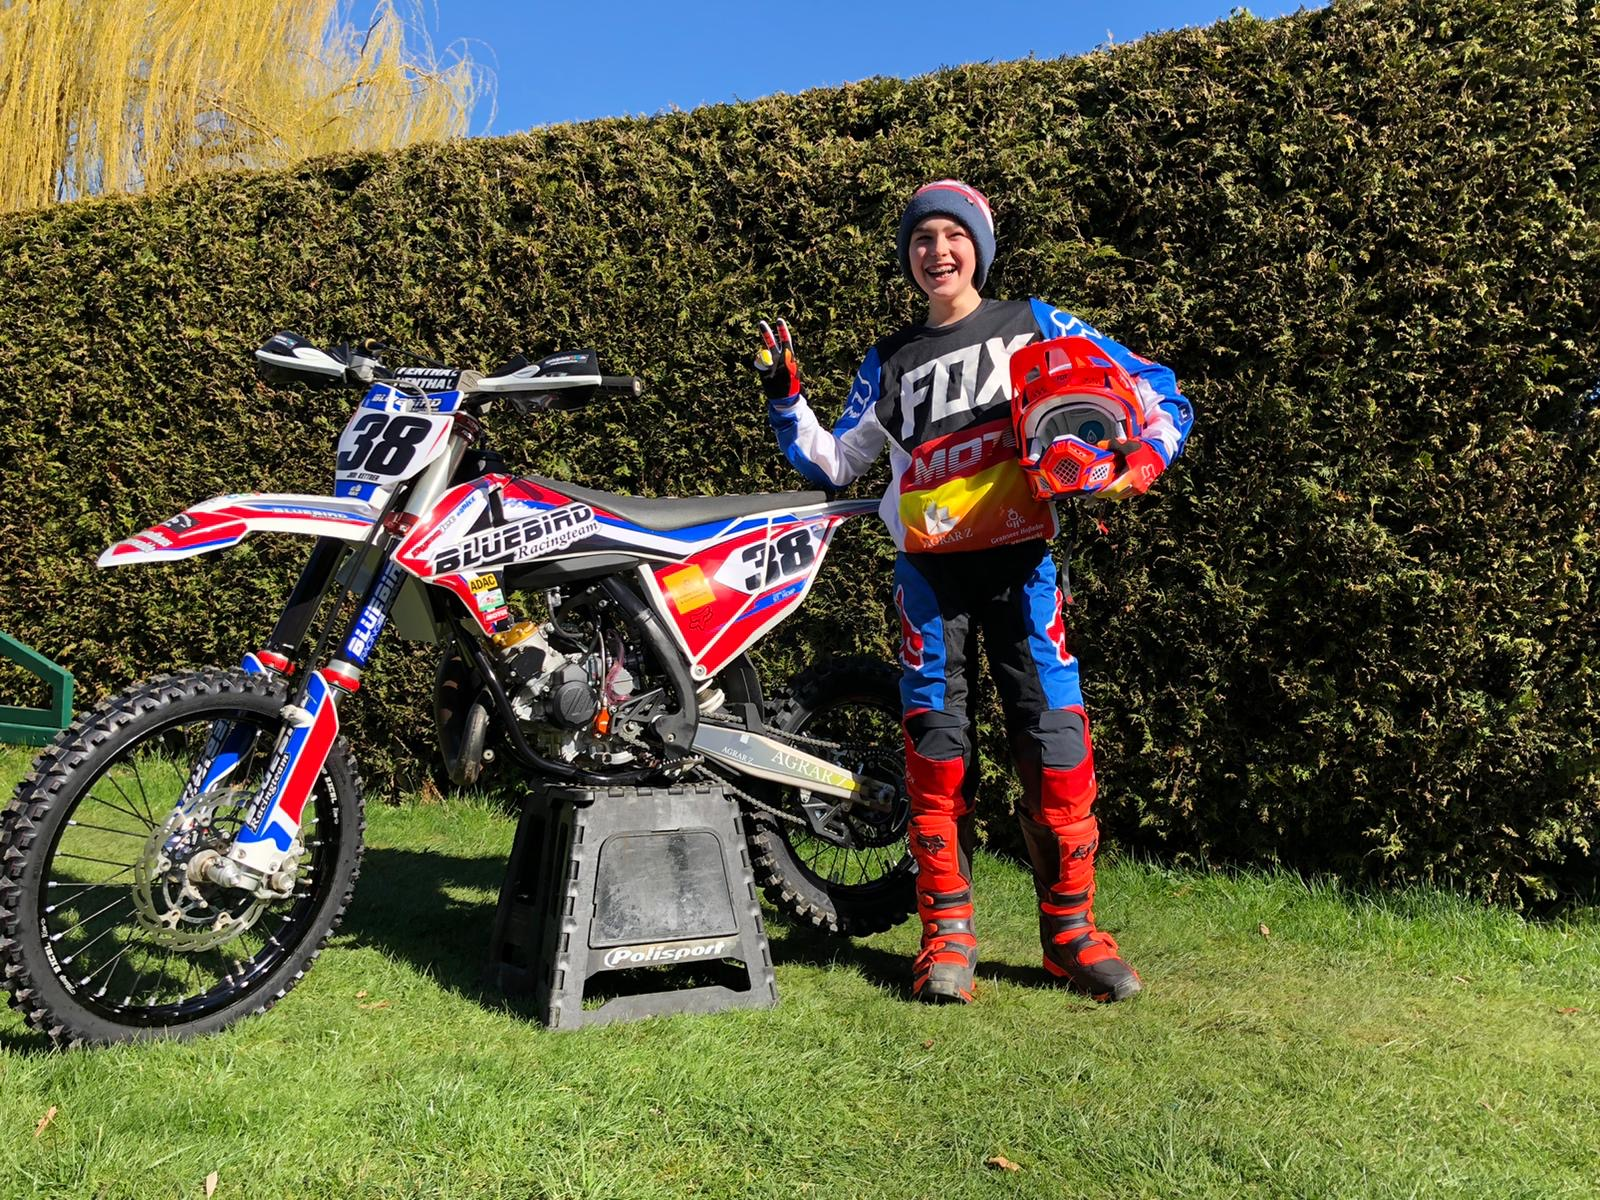 Motorrad 2020 Jan-Erik Kettner